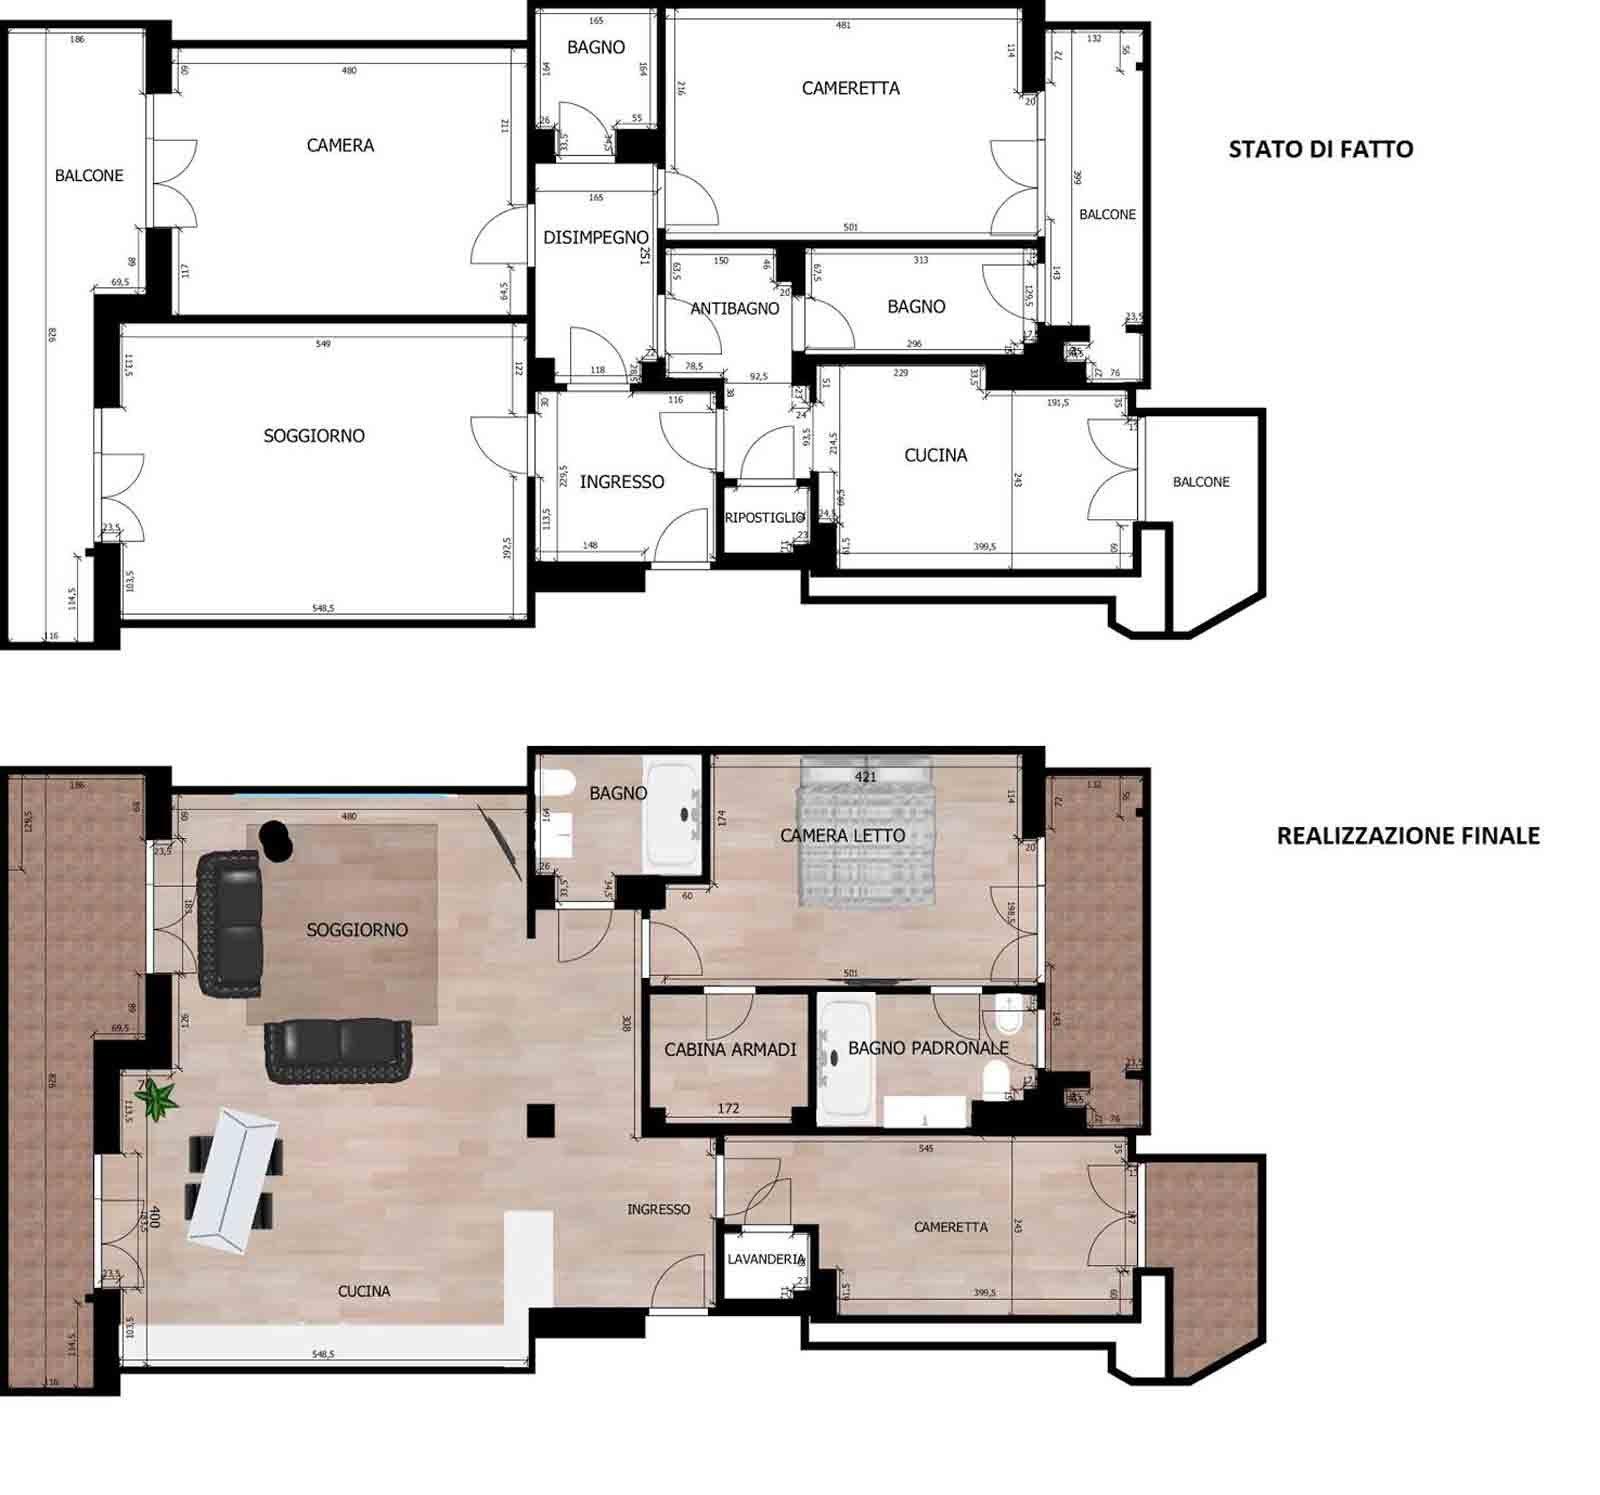 planimetrie cose di casa with planimetria case